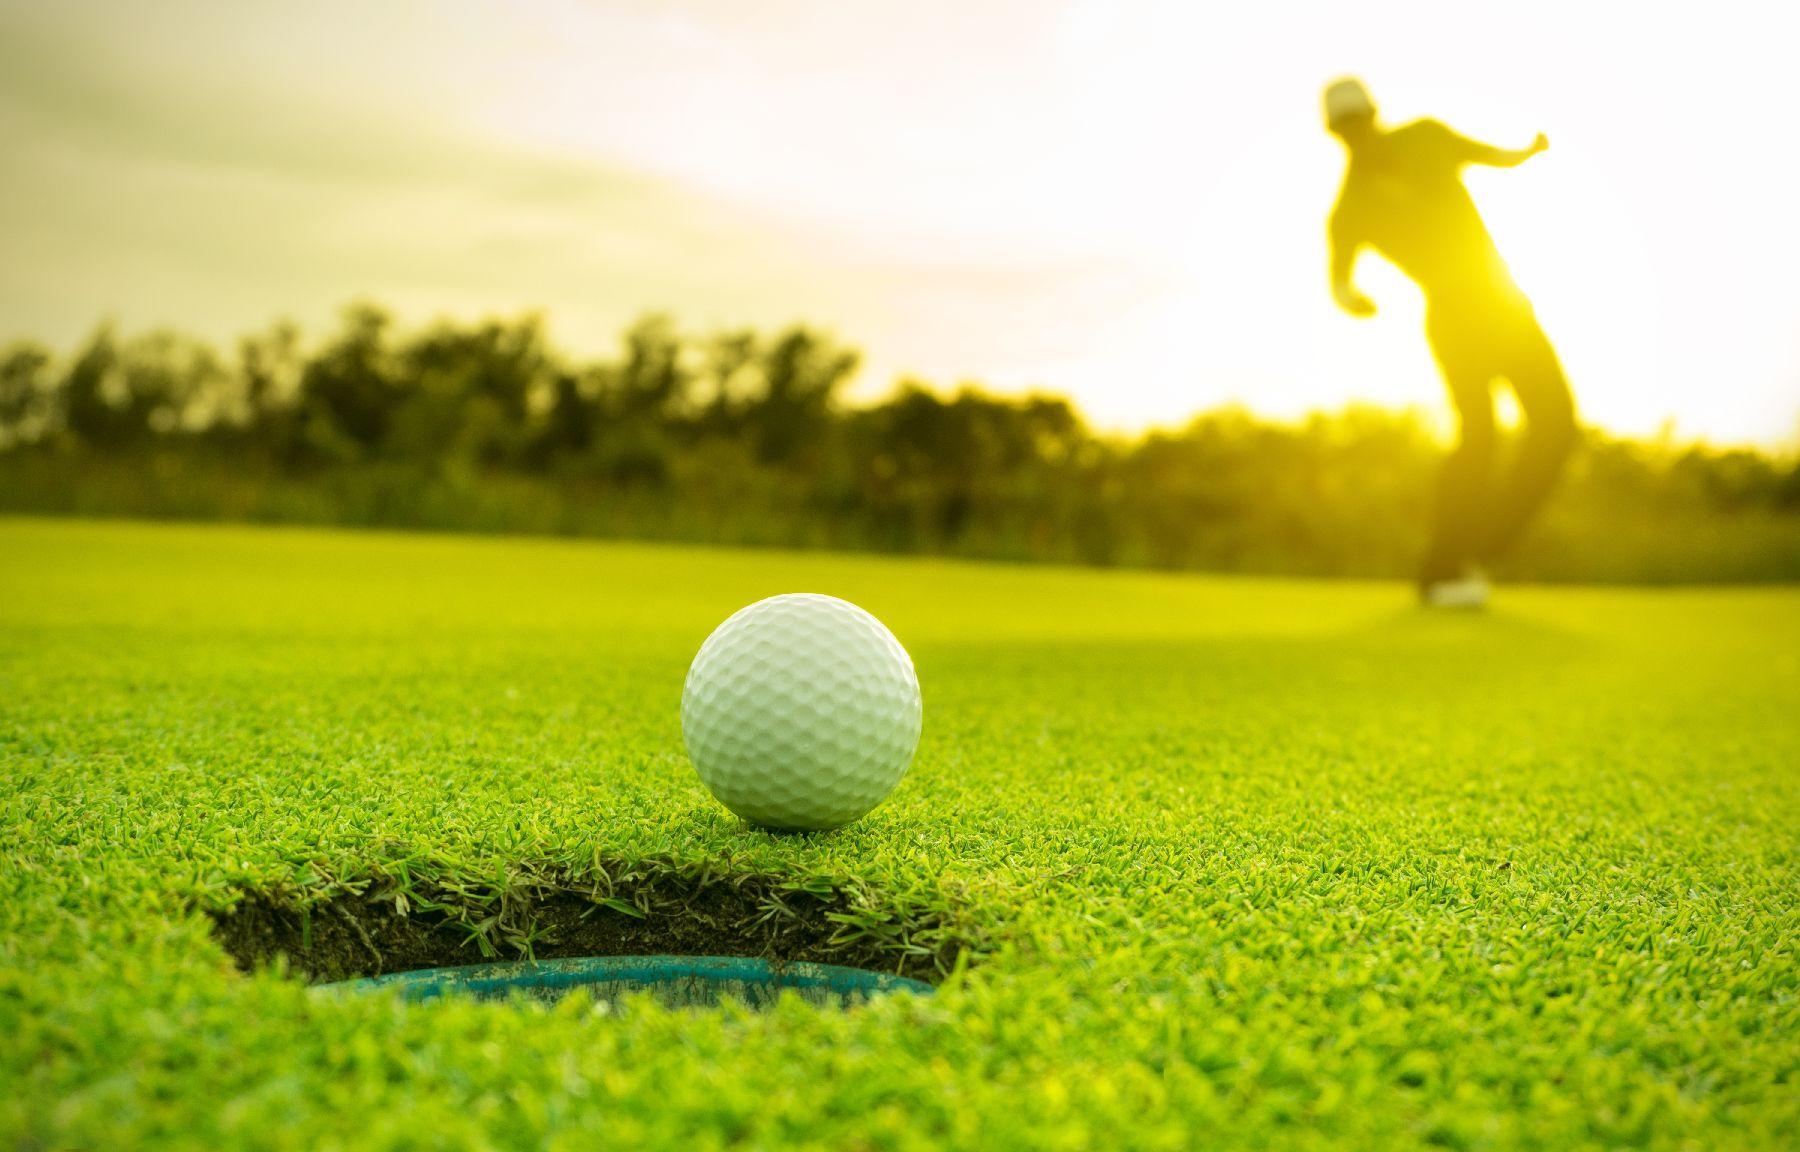 golf business analogy